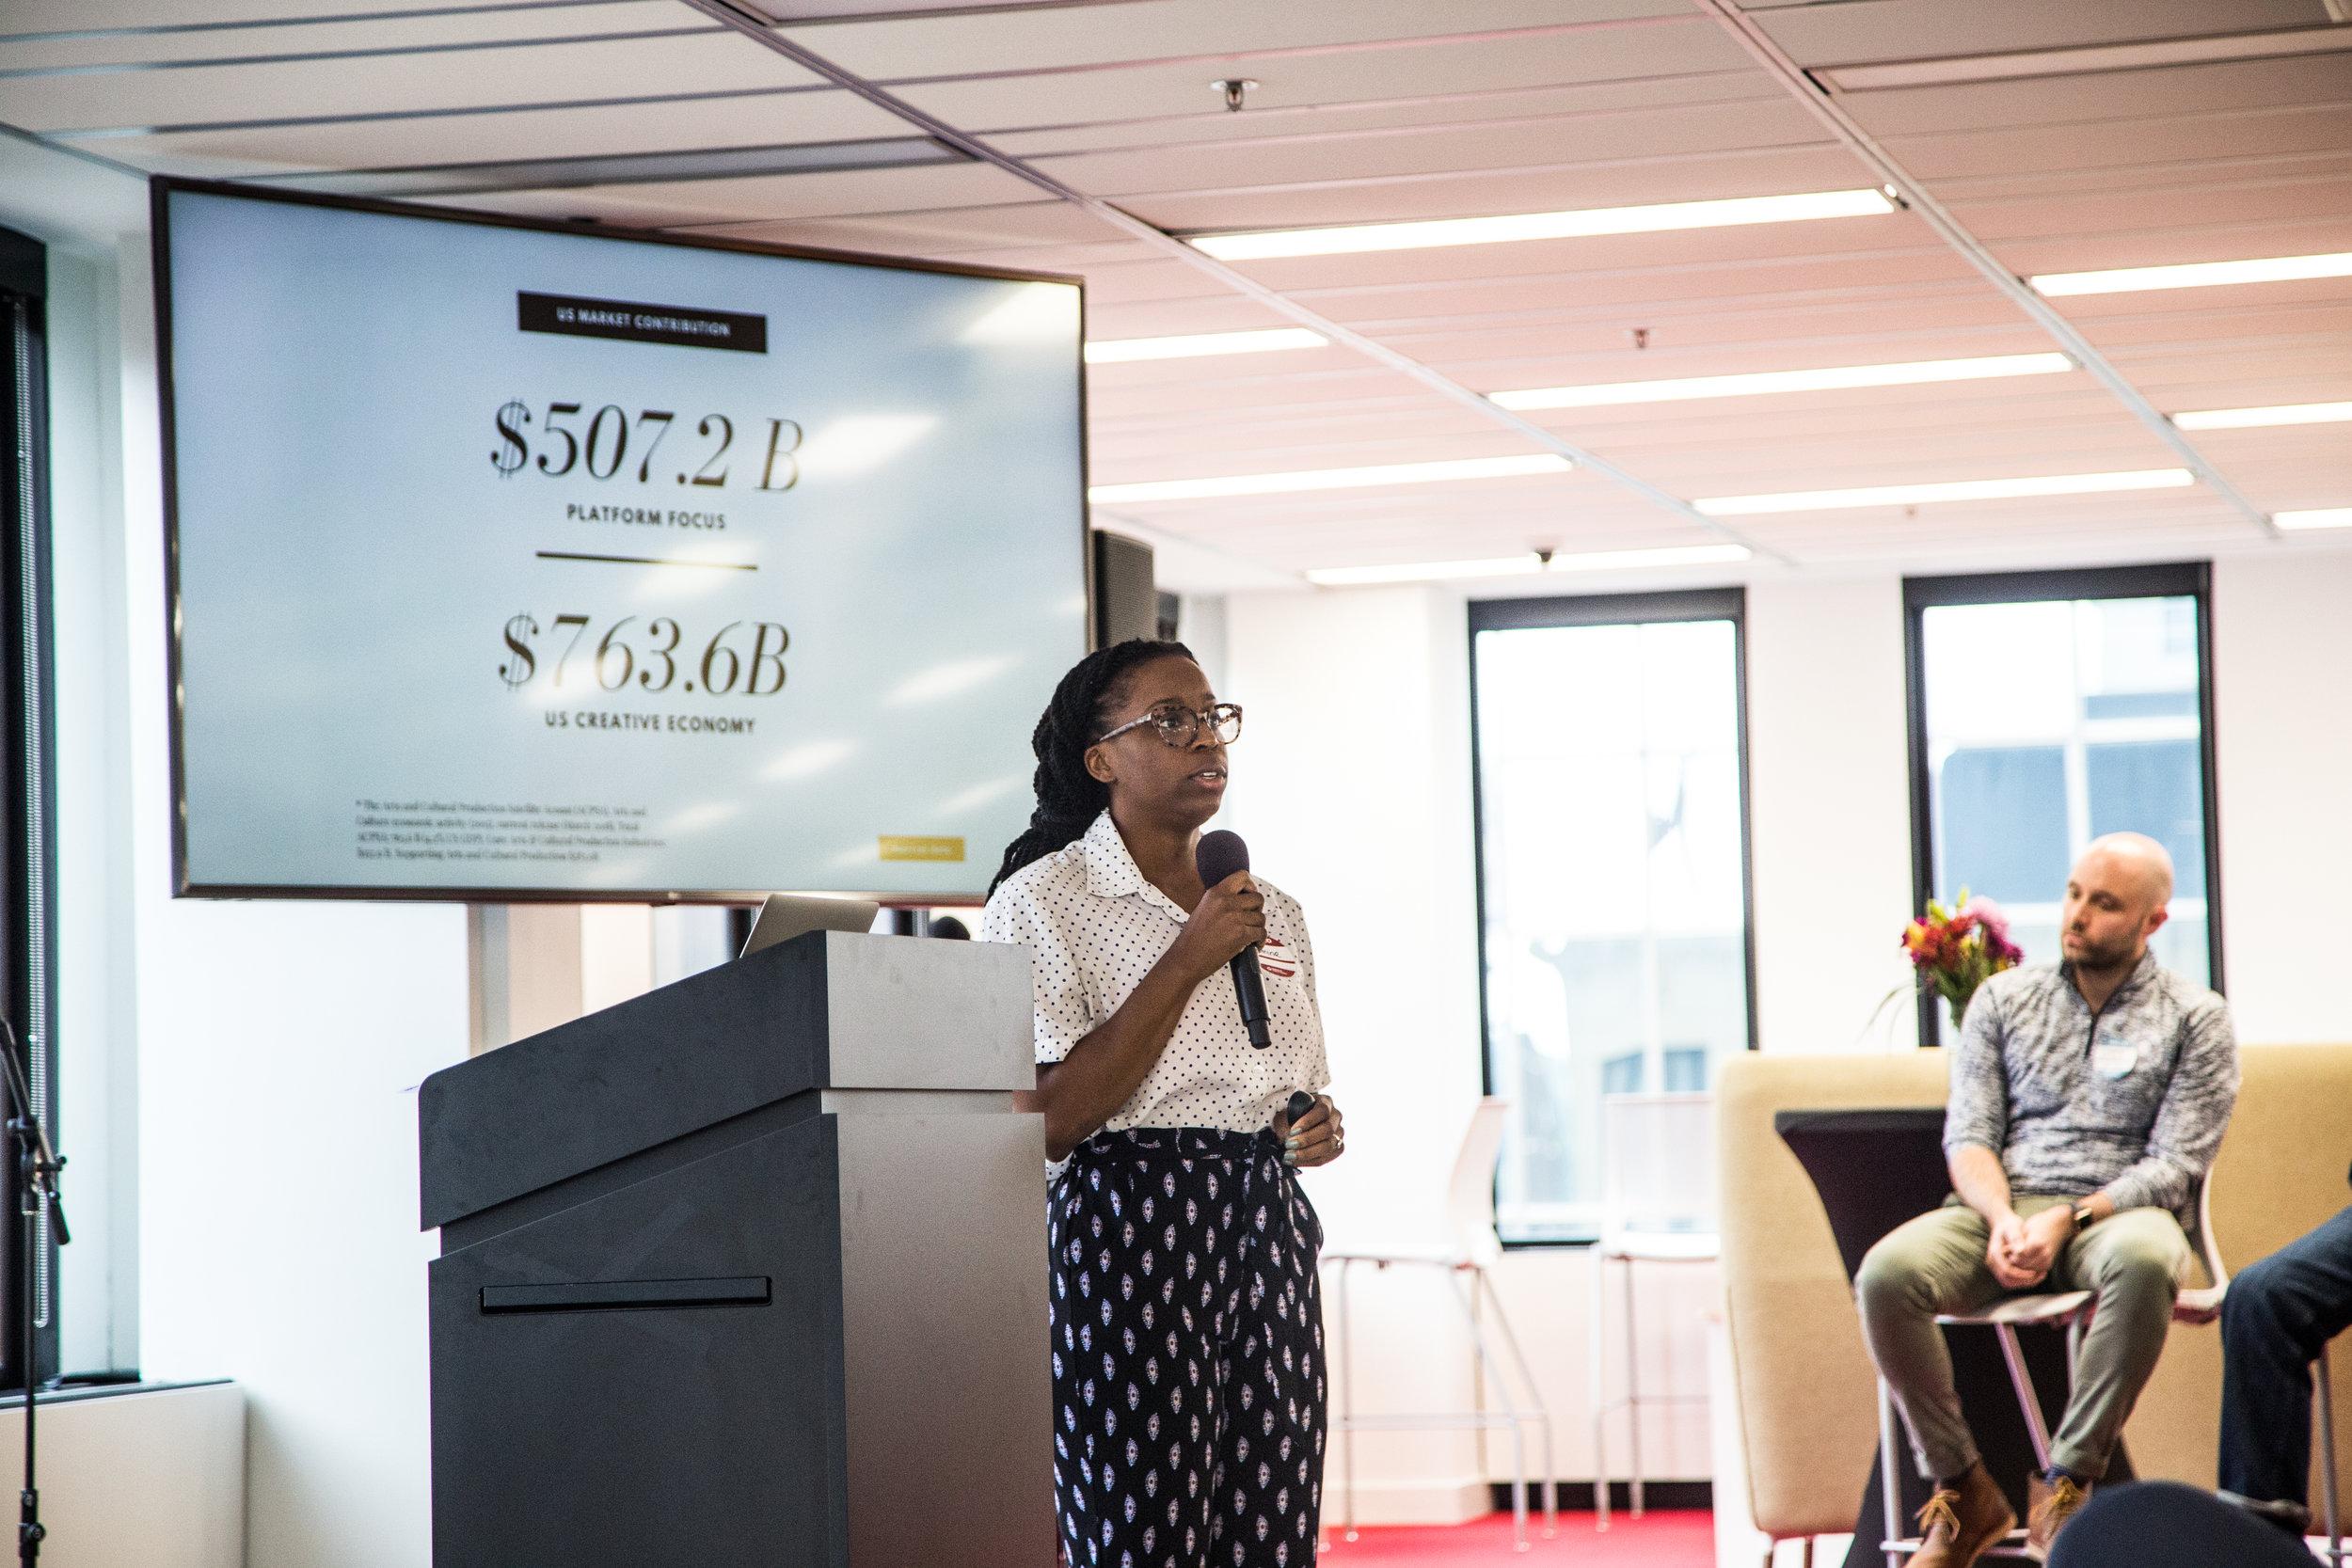 Monicat Data co-founder Jasmine Russell speaks at a Lunar Startups event.